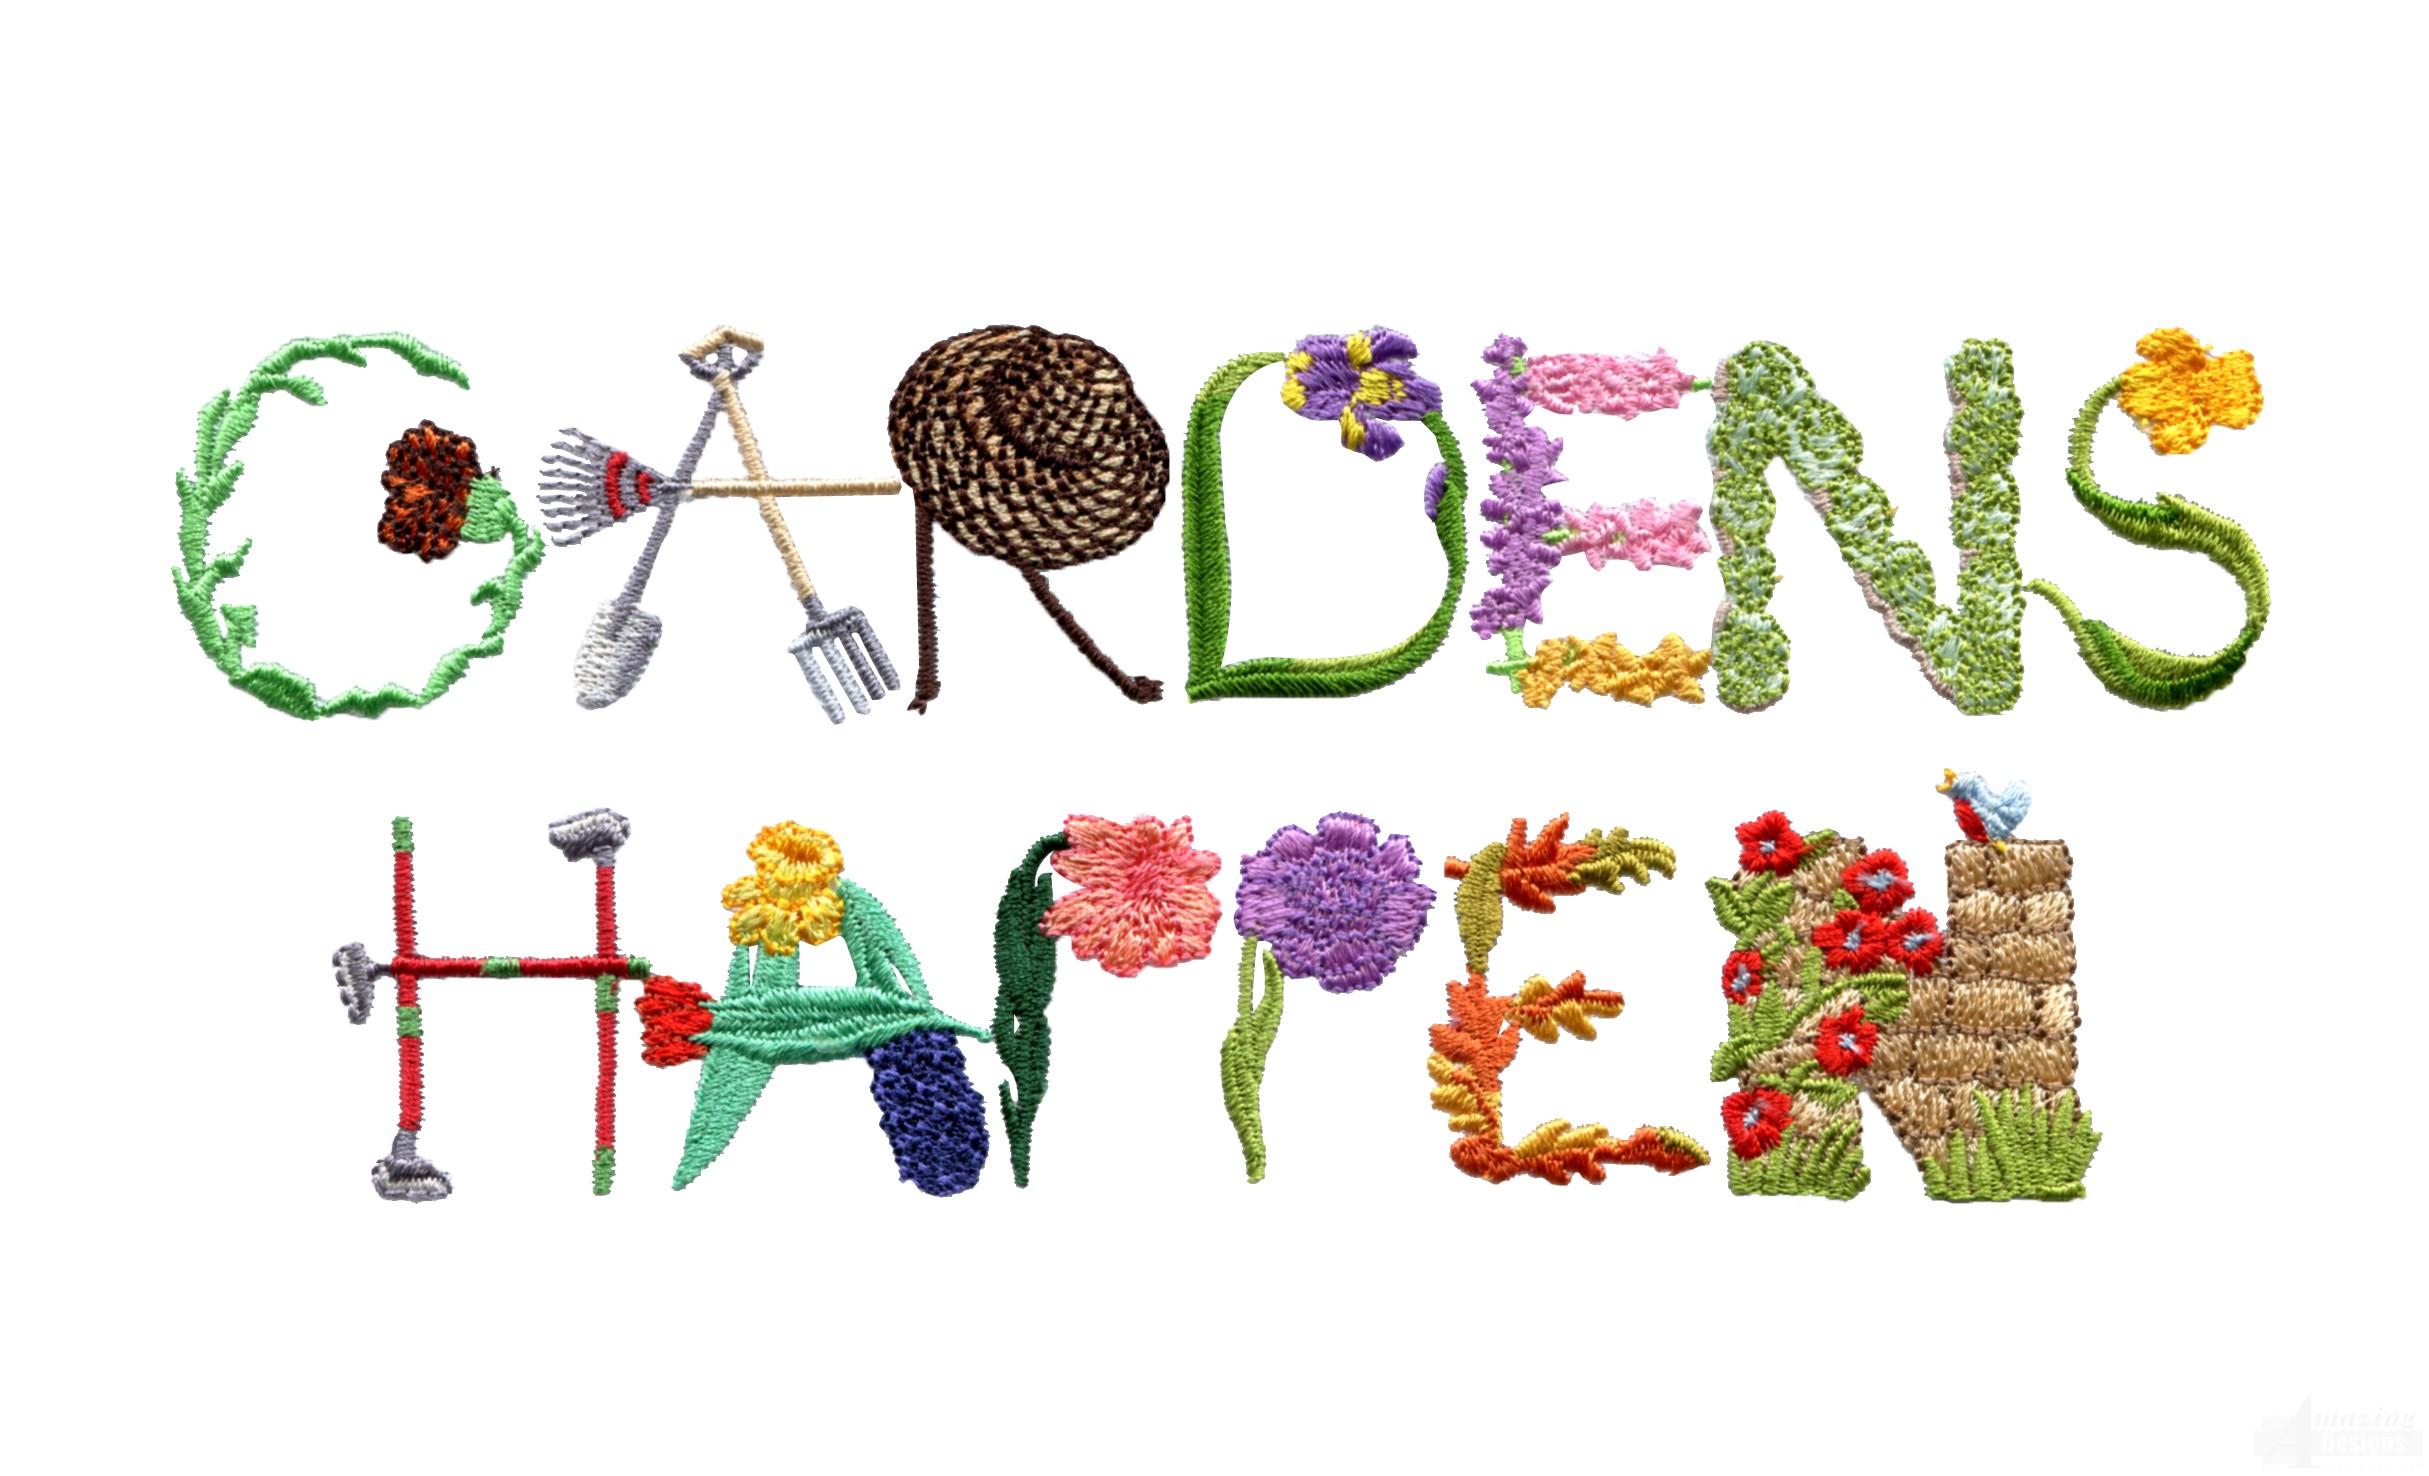 Gardens happen embroidery design for Garden embroidery designs